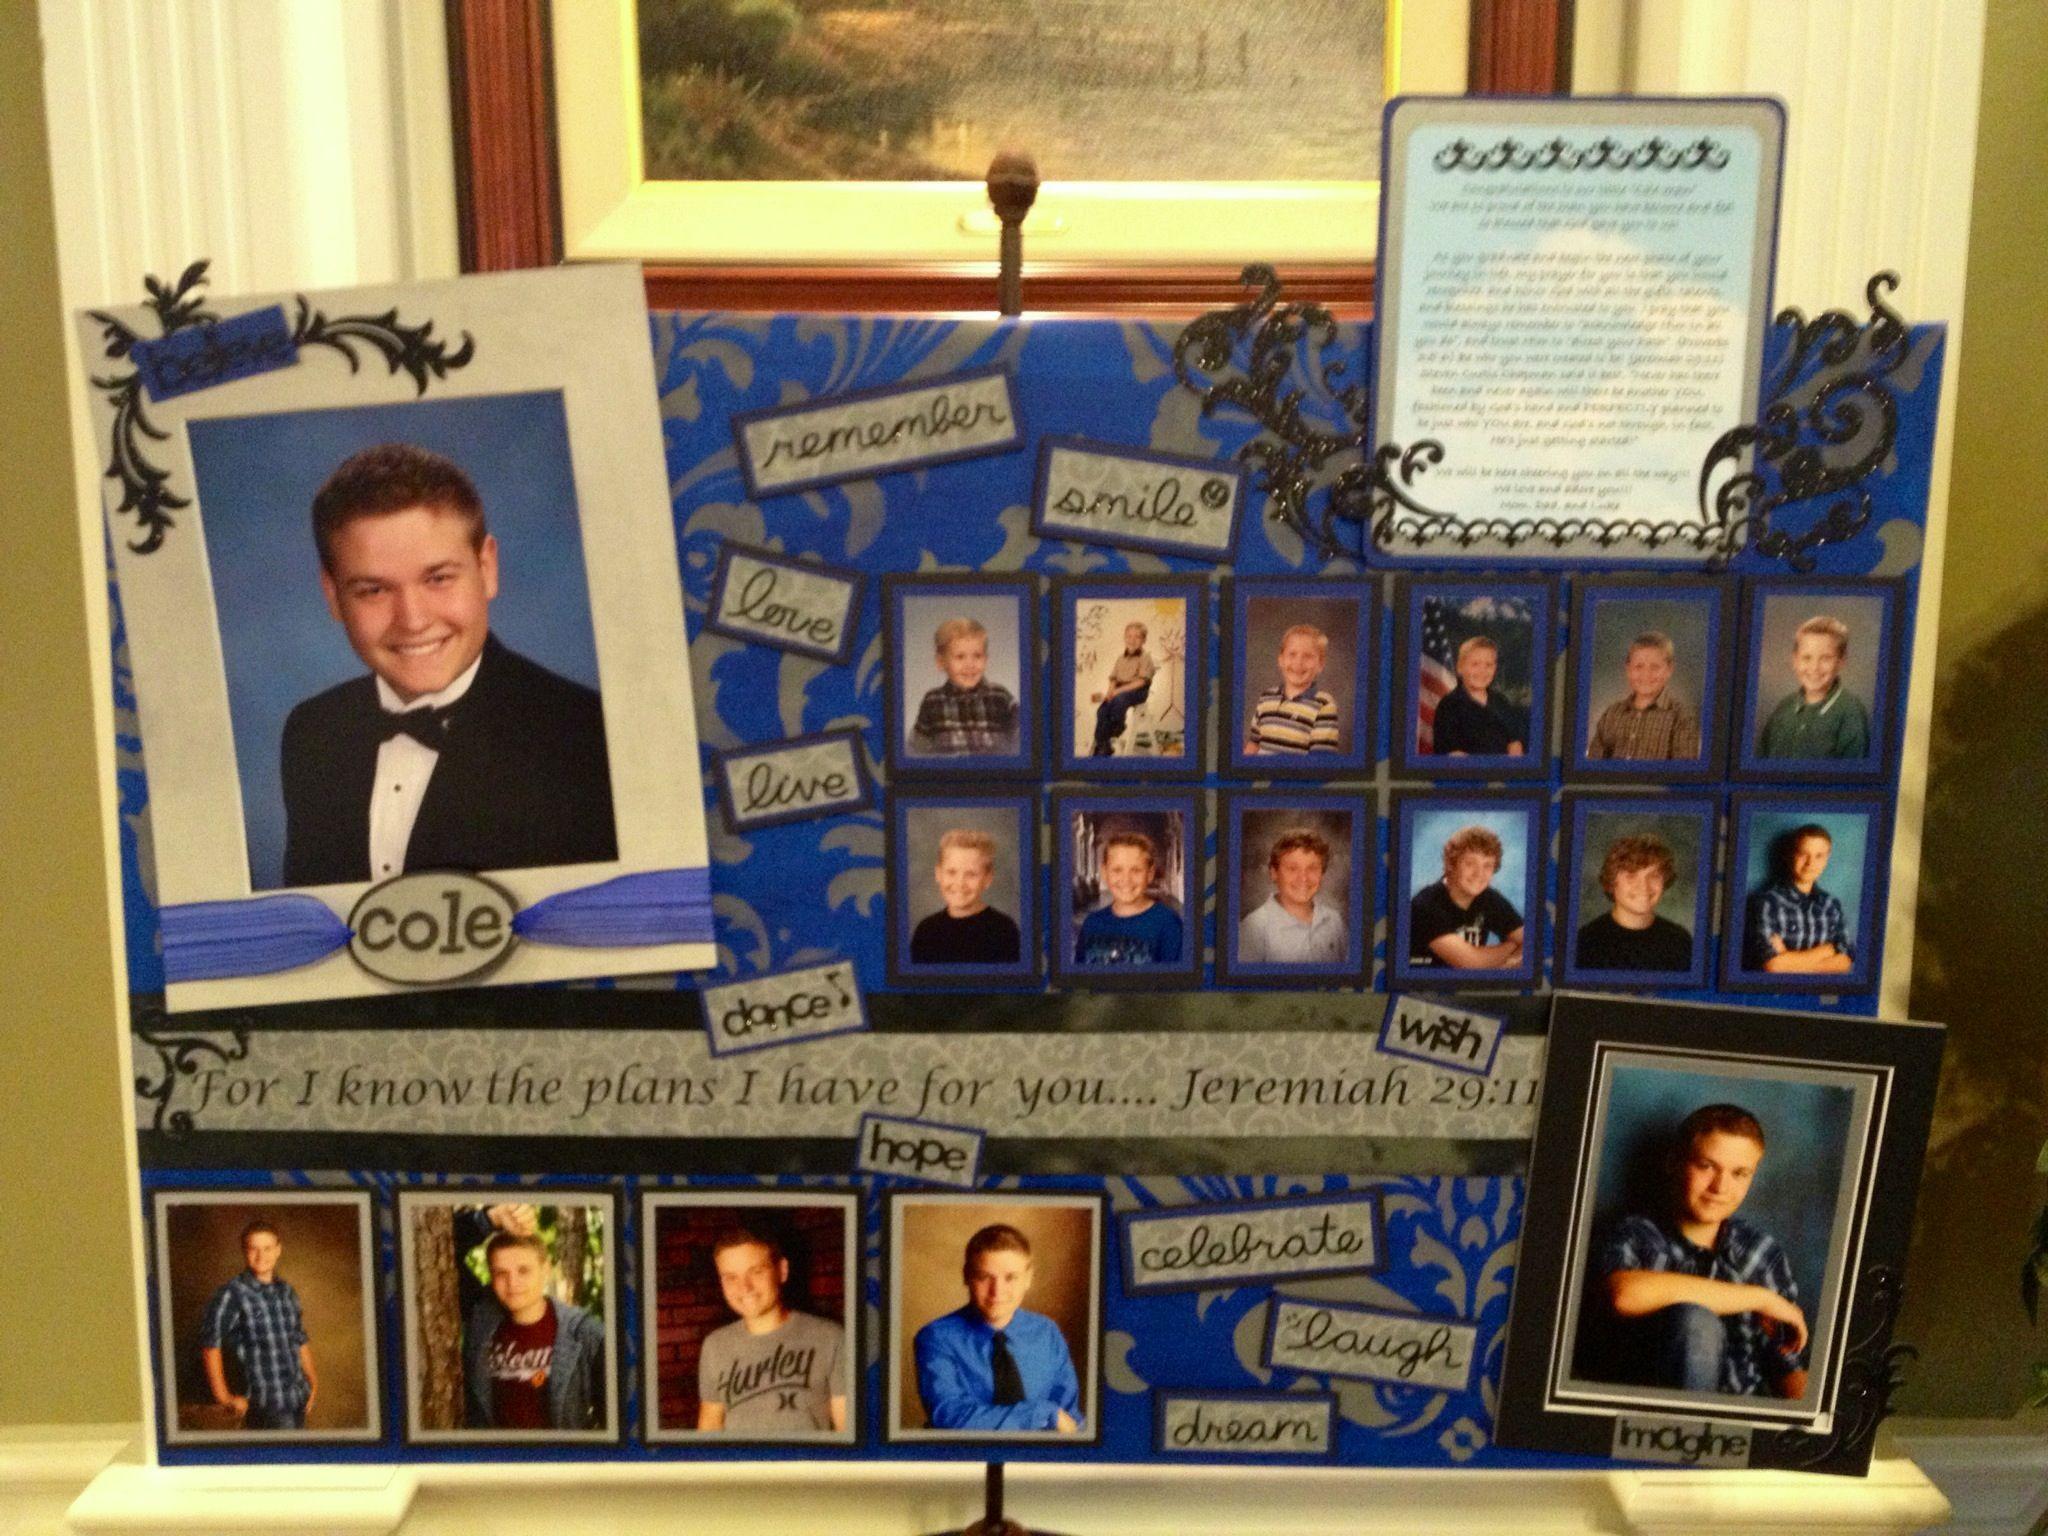 Scrapbook ideas graduation - Cole S Graduation Memory Board Thank You For The Idea Http Creationsfrommyheart Blogspot